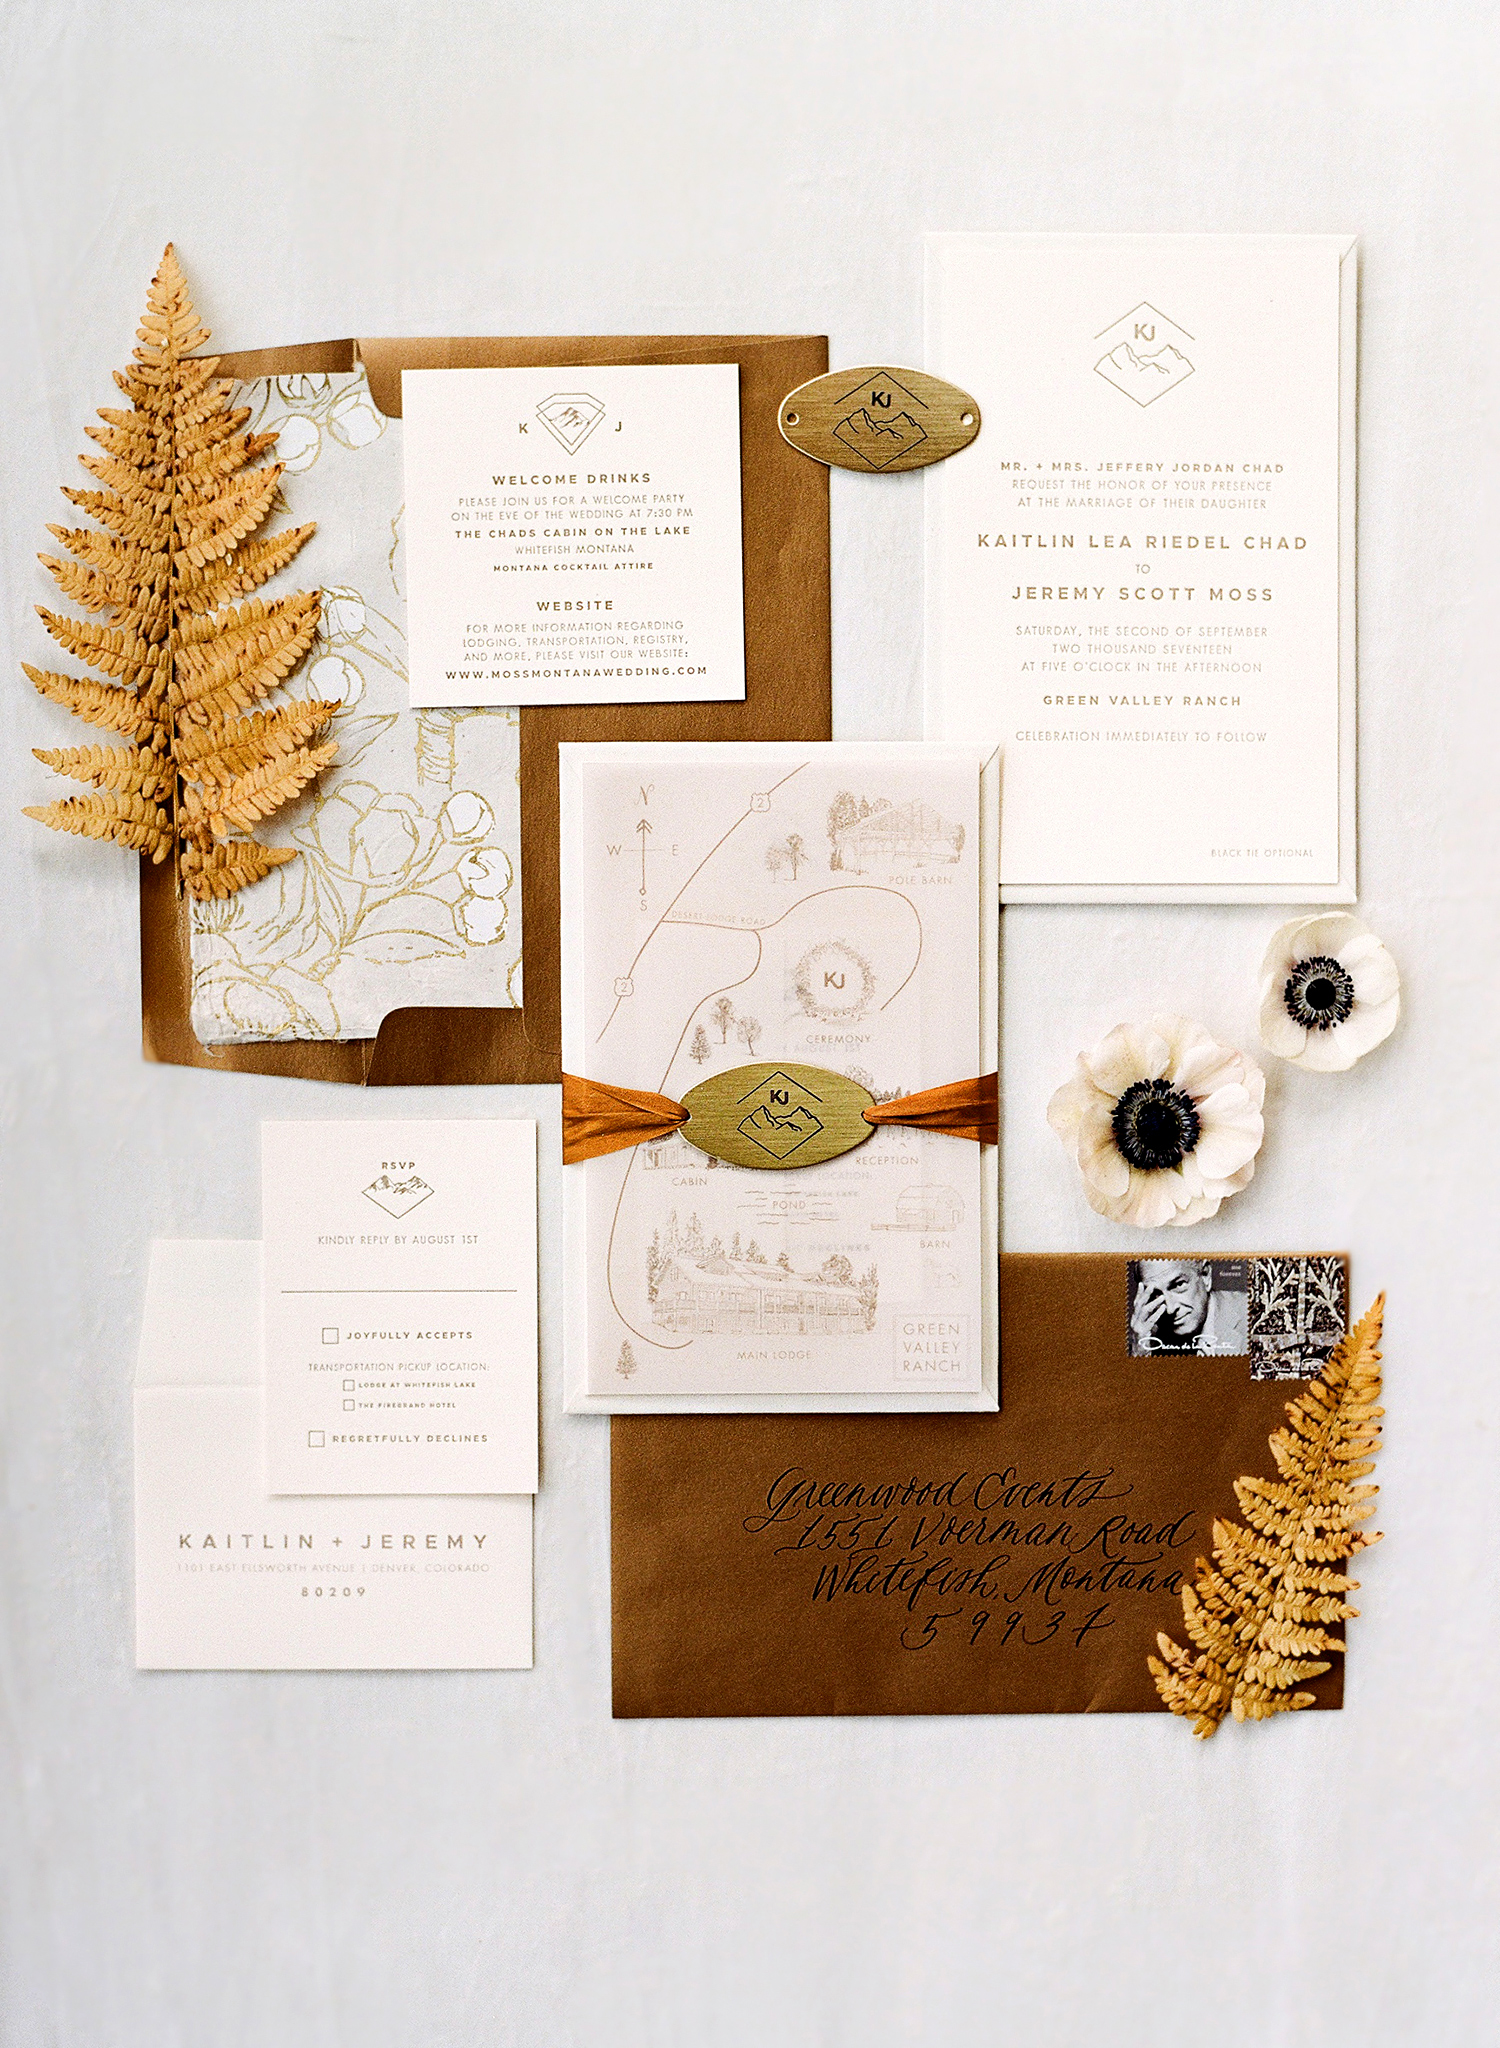 kaitlin jeremy wedding invitation